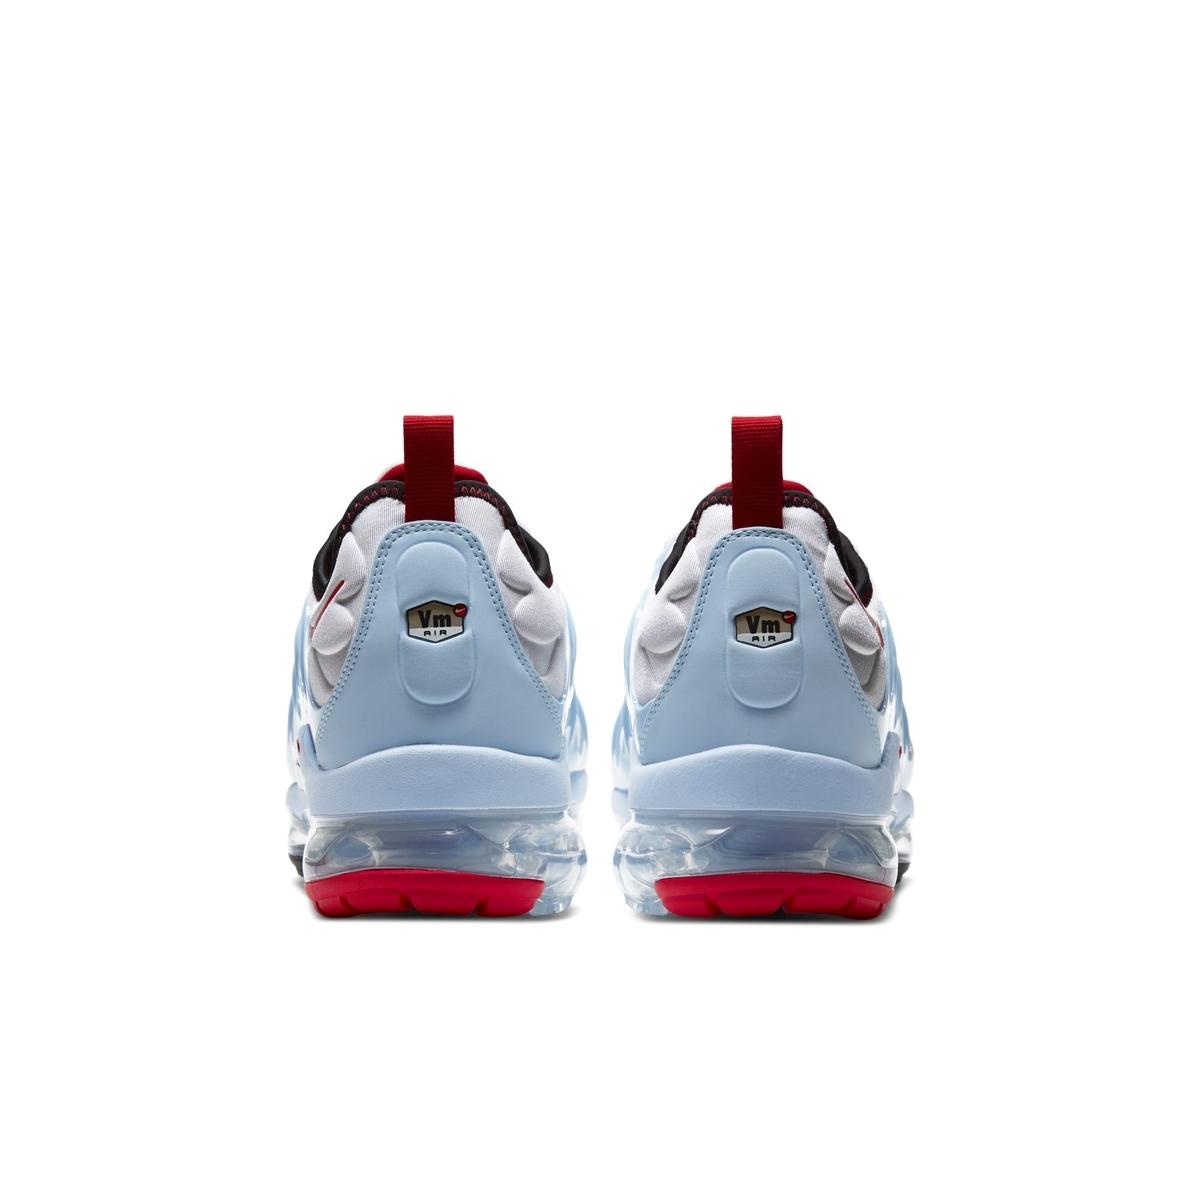 vapormax plus,发售,Nike 超诱人的小清新装扮!这双 VaporMax Plus 能真香么?